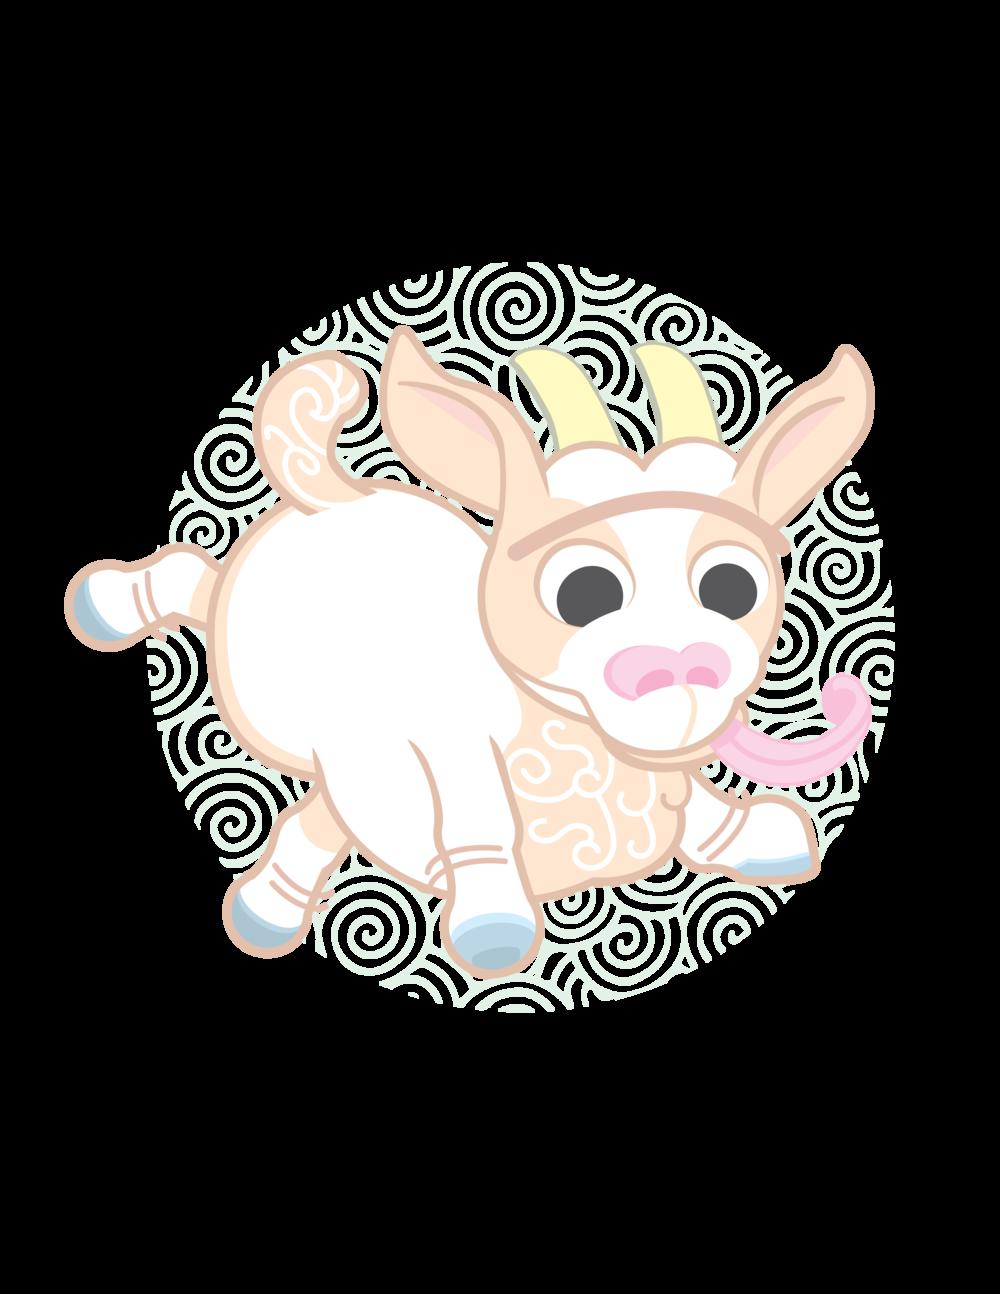 Illo_Teepublic_ZO_goat-01.png